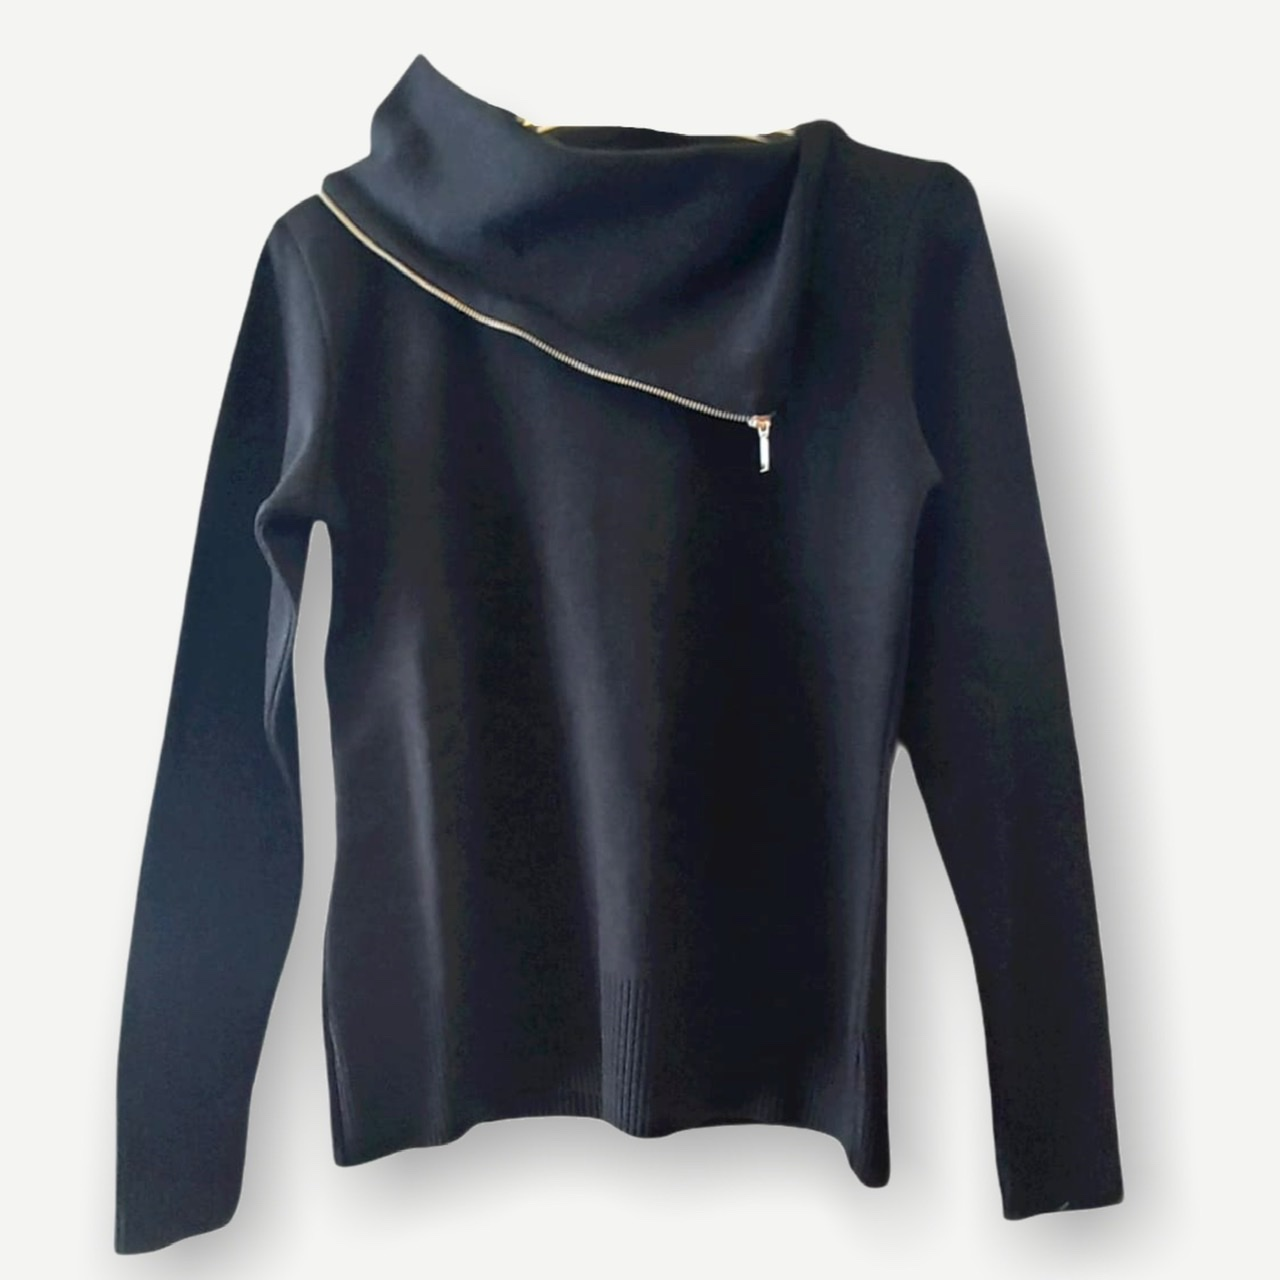 Blusa Fernanda preta tricot  - Vivian Bógus